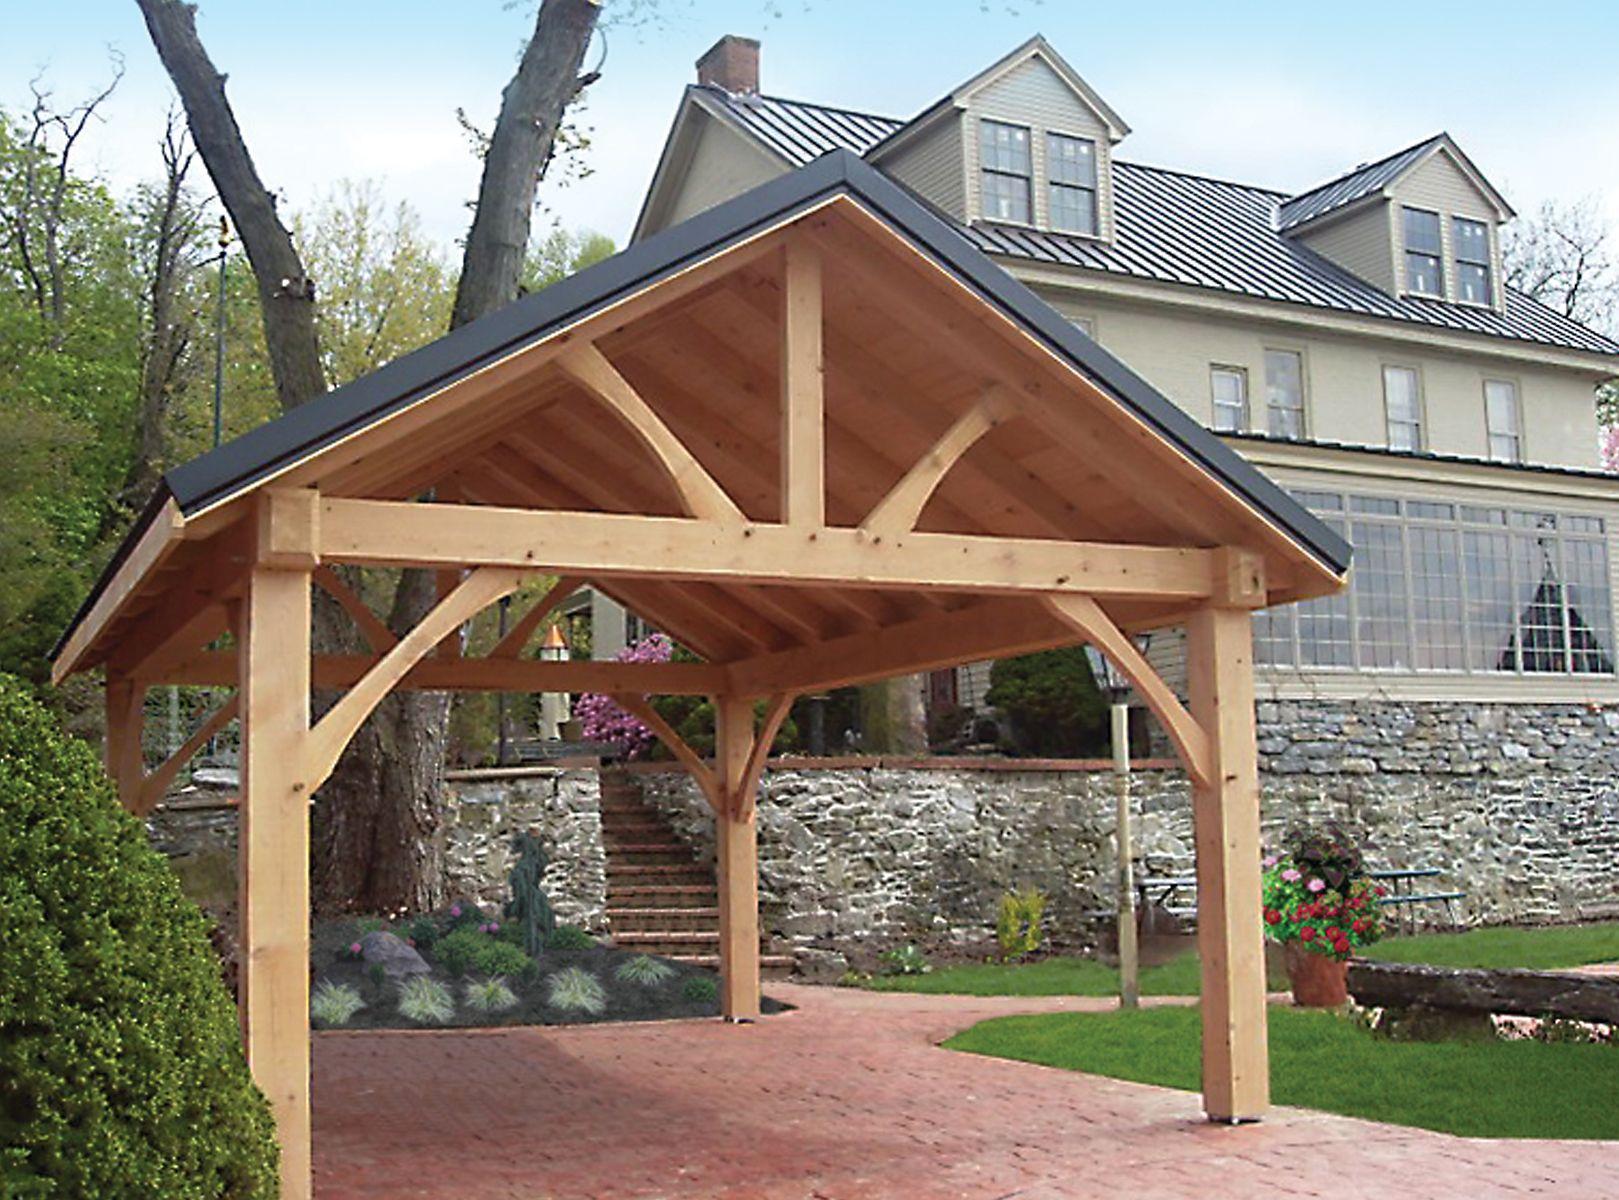 12x20 Pavilion Backyard Pavilion Timber Framing Outdoor Living